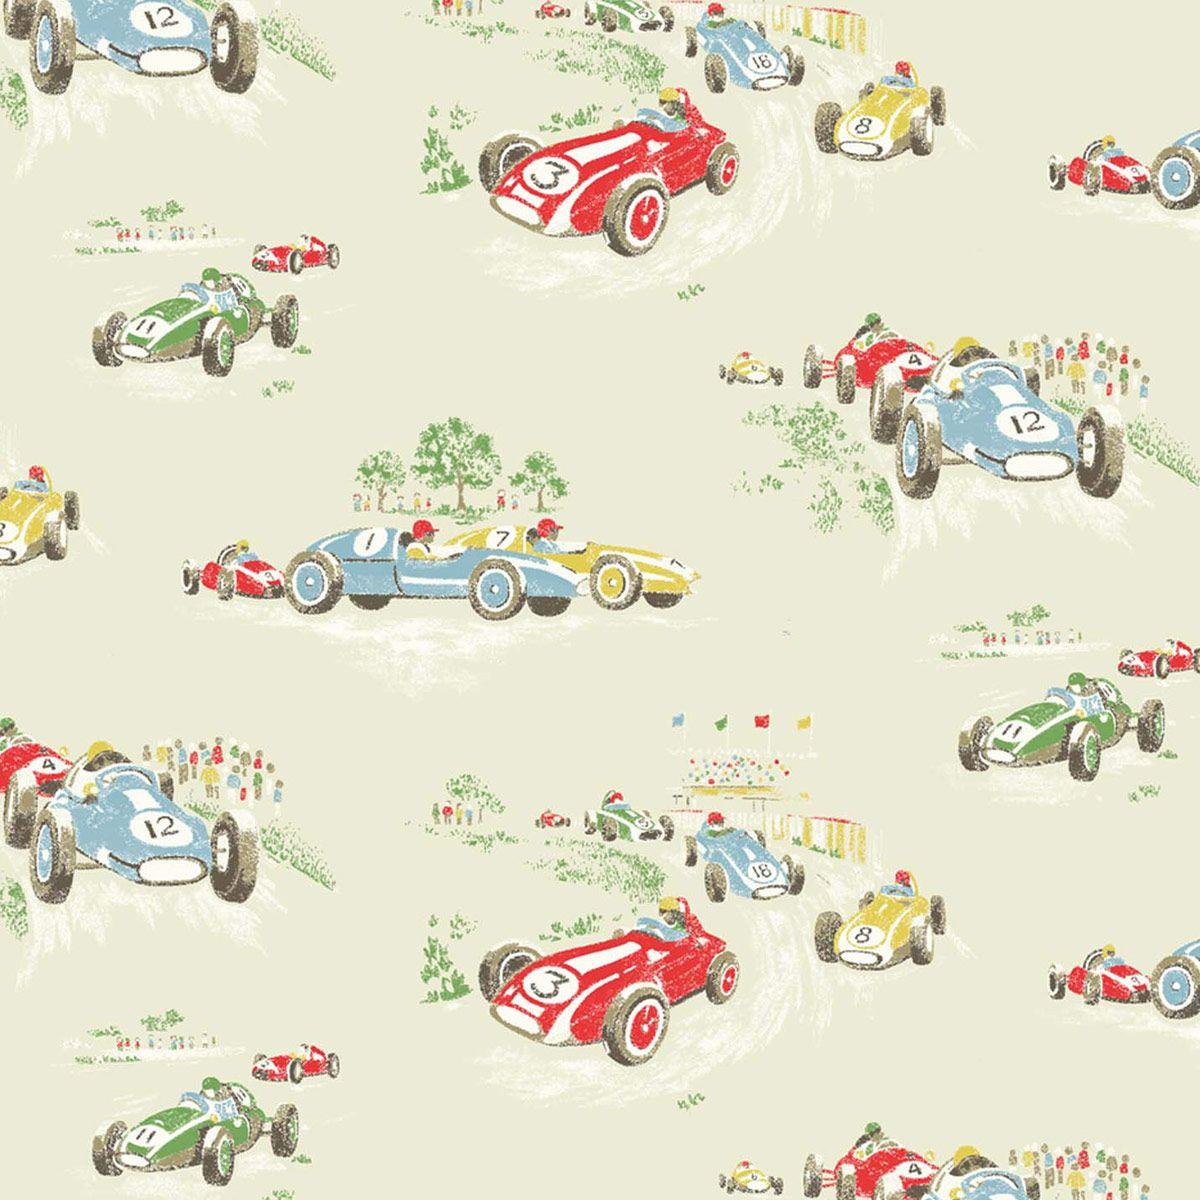 Charmant Wallpaper | Vintage Car Wallpaper | CathKidston...so Cute For A Boyu0027s Room